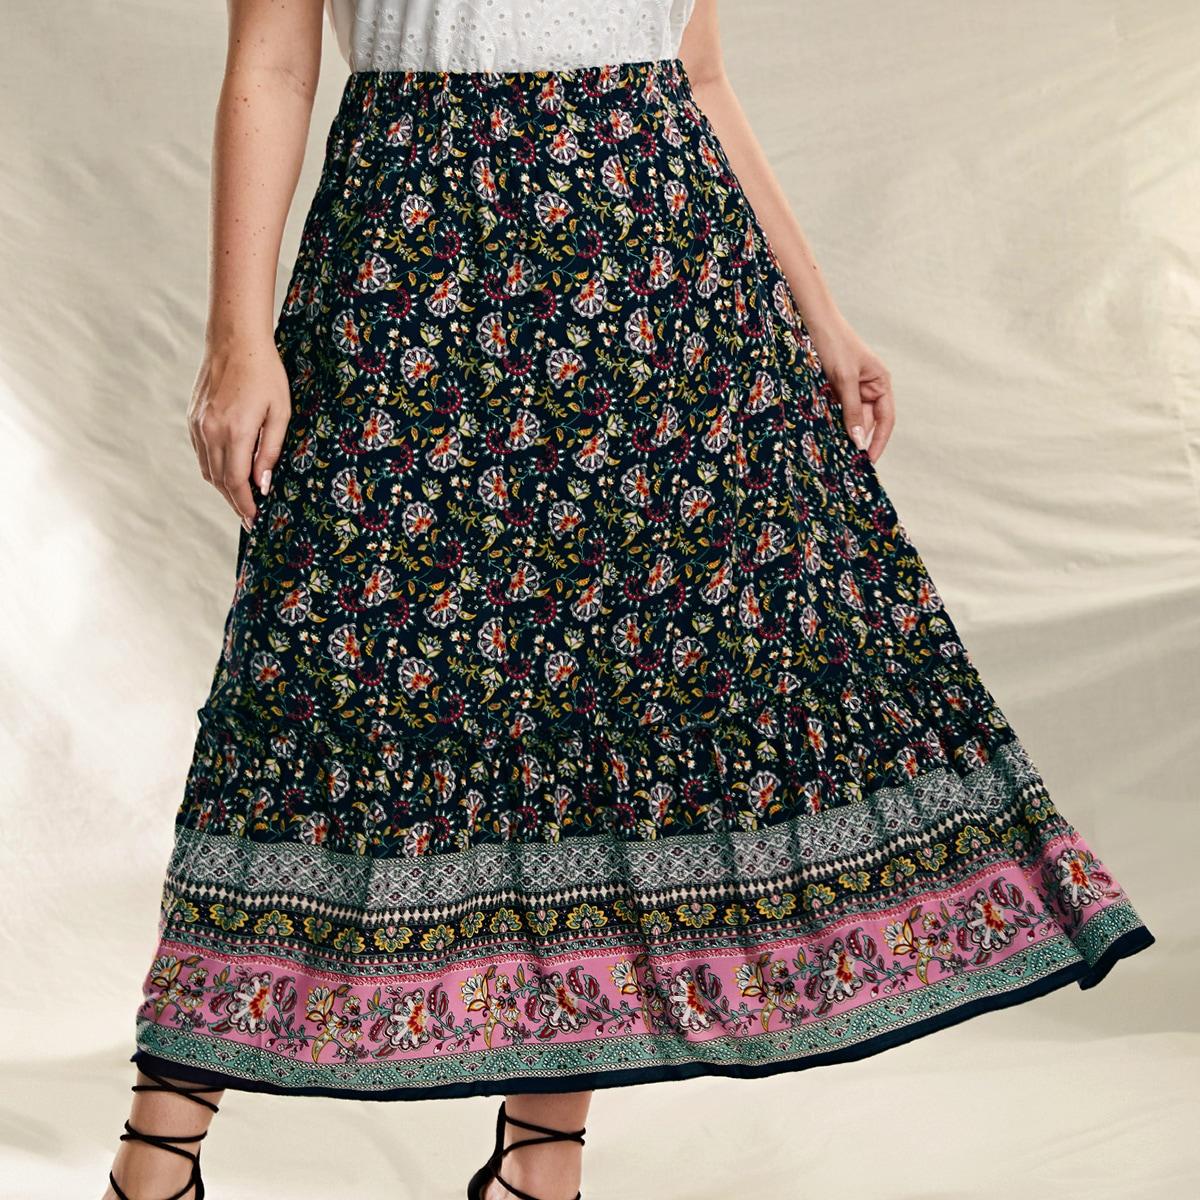 SHEIN / Plus Frill Trim Allover Floral Skirt